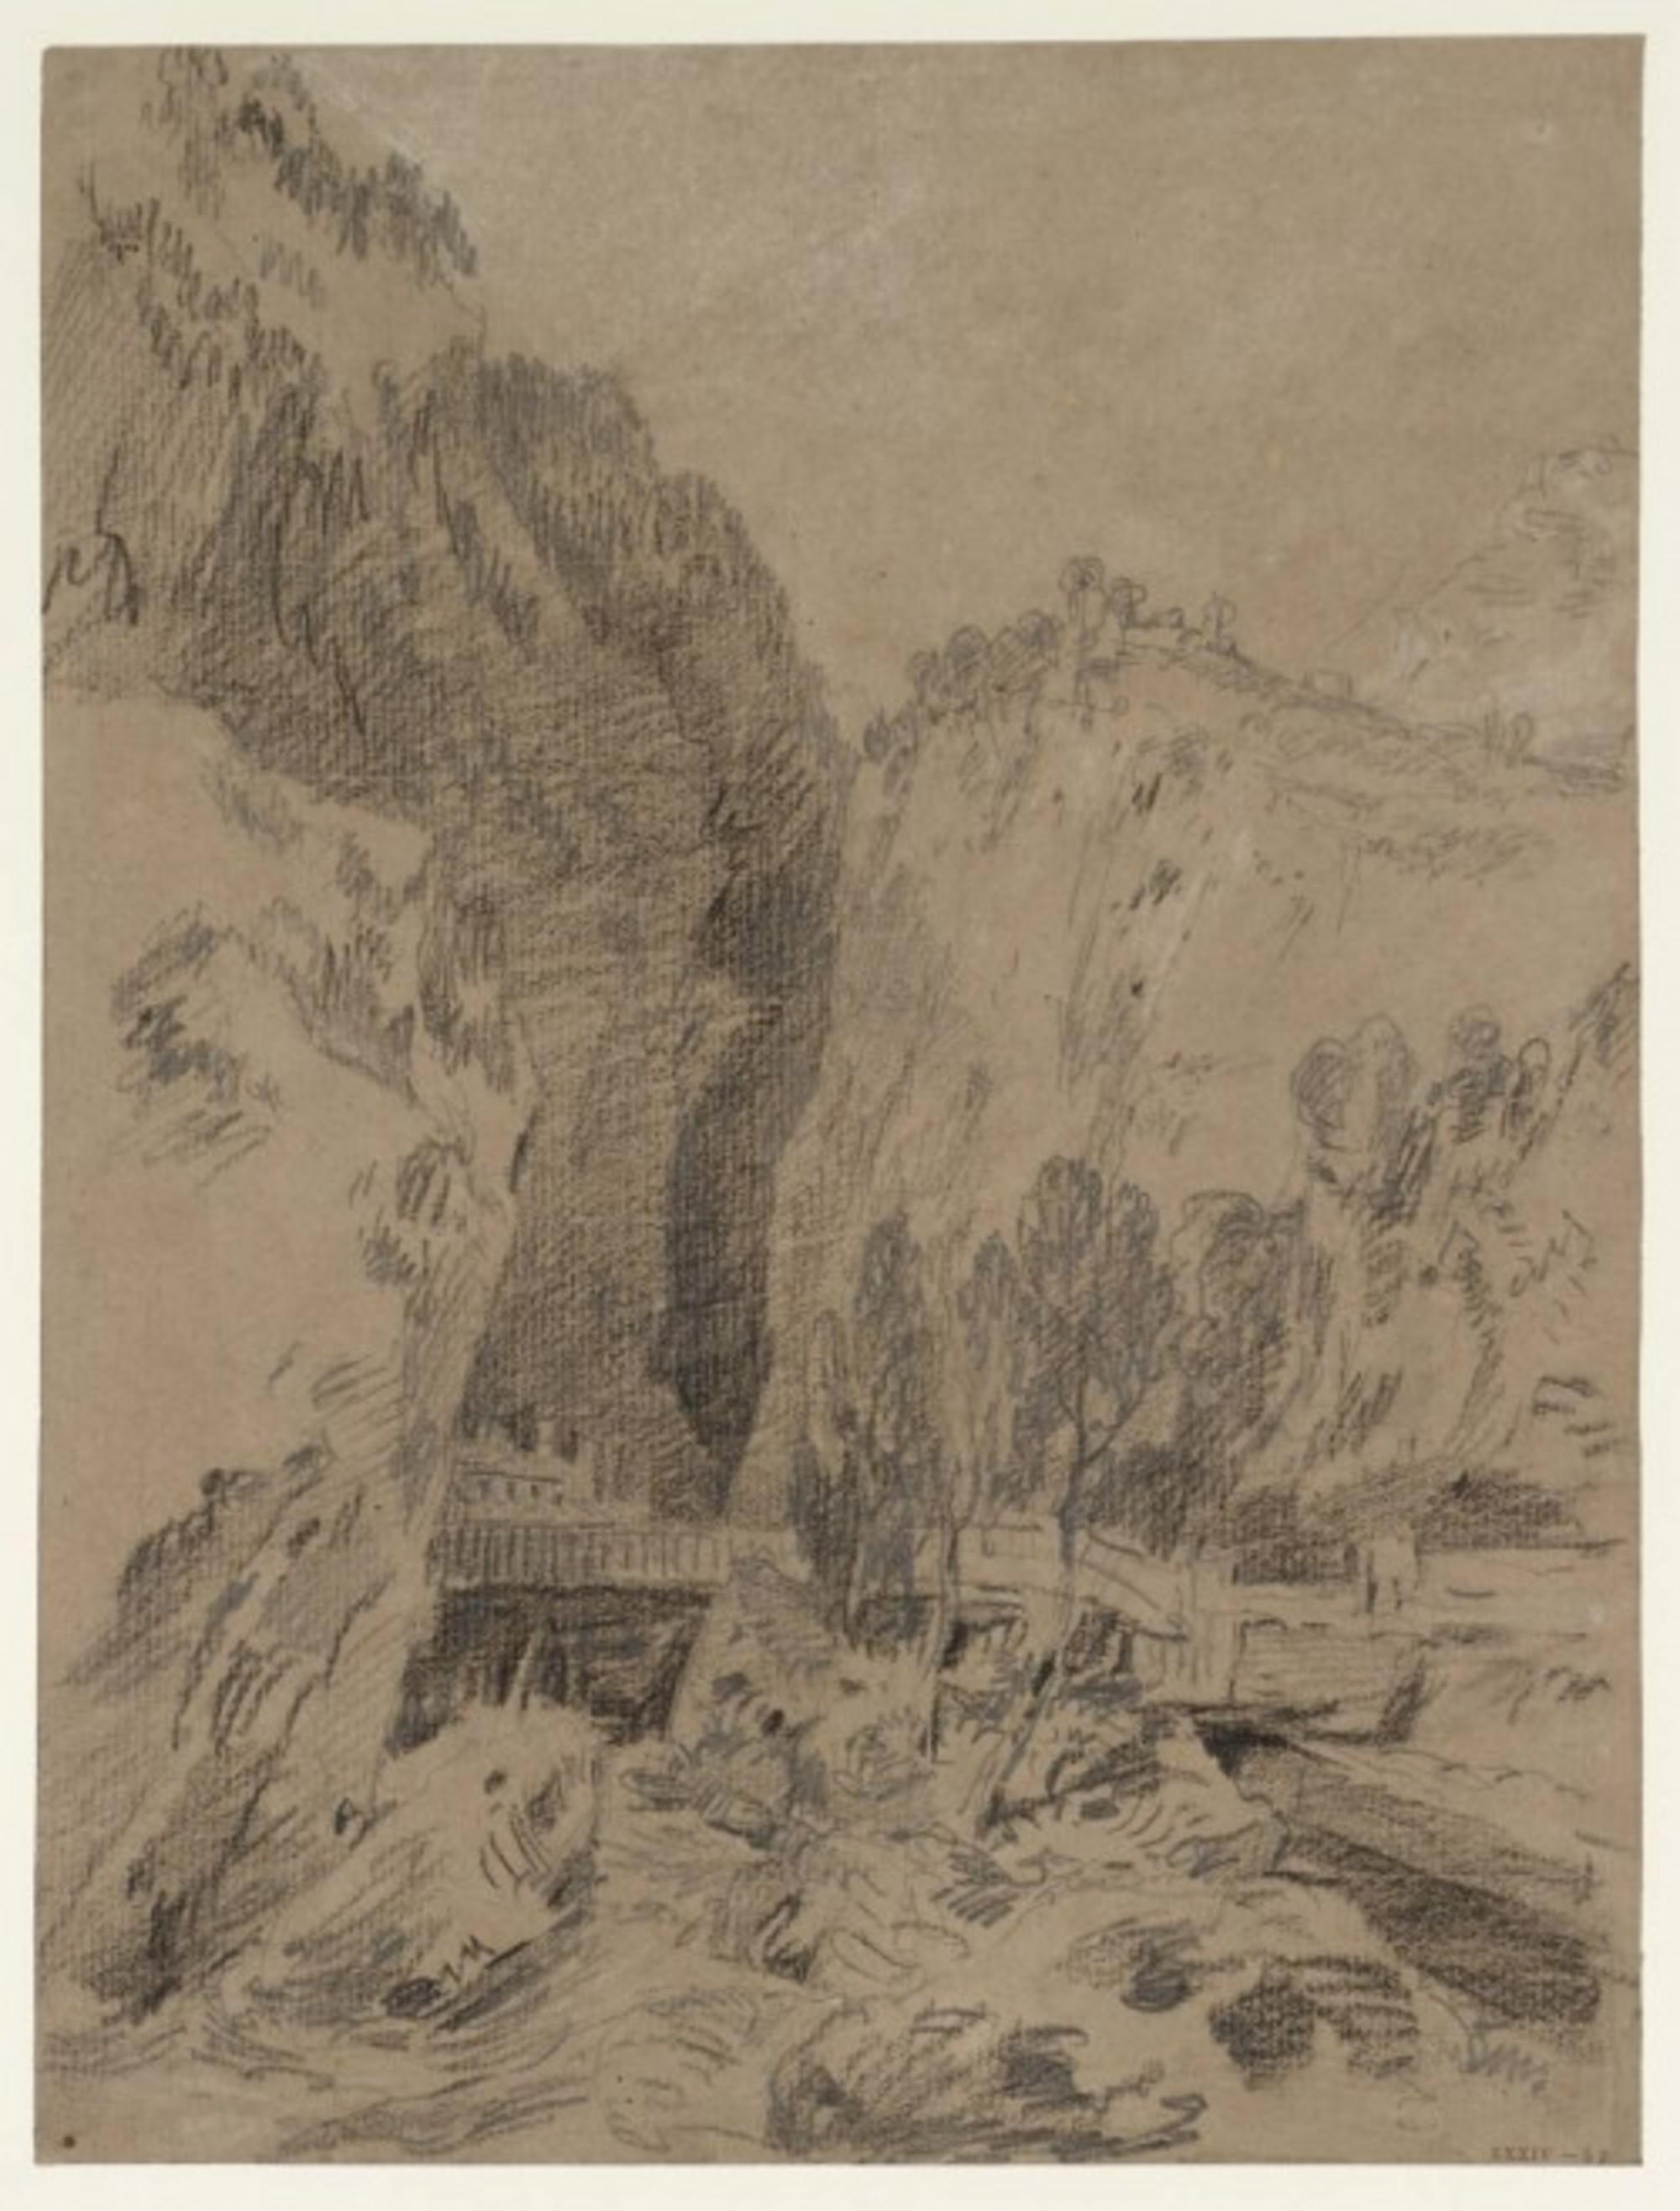 The-Baths-of-St-Didier-near-Courmayeur-Val-dAosta-1802.jpg